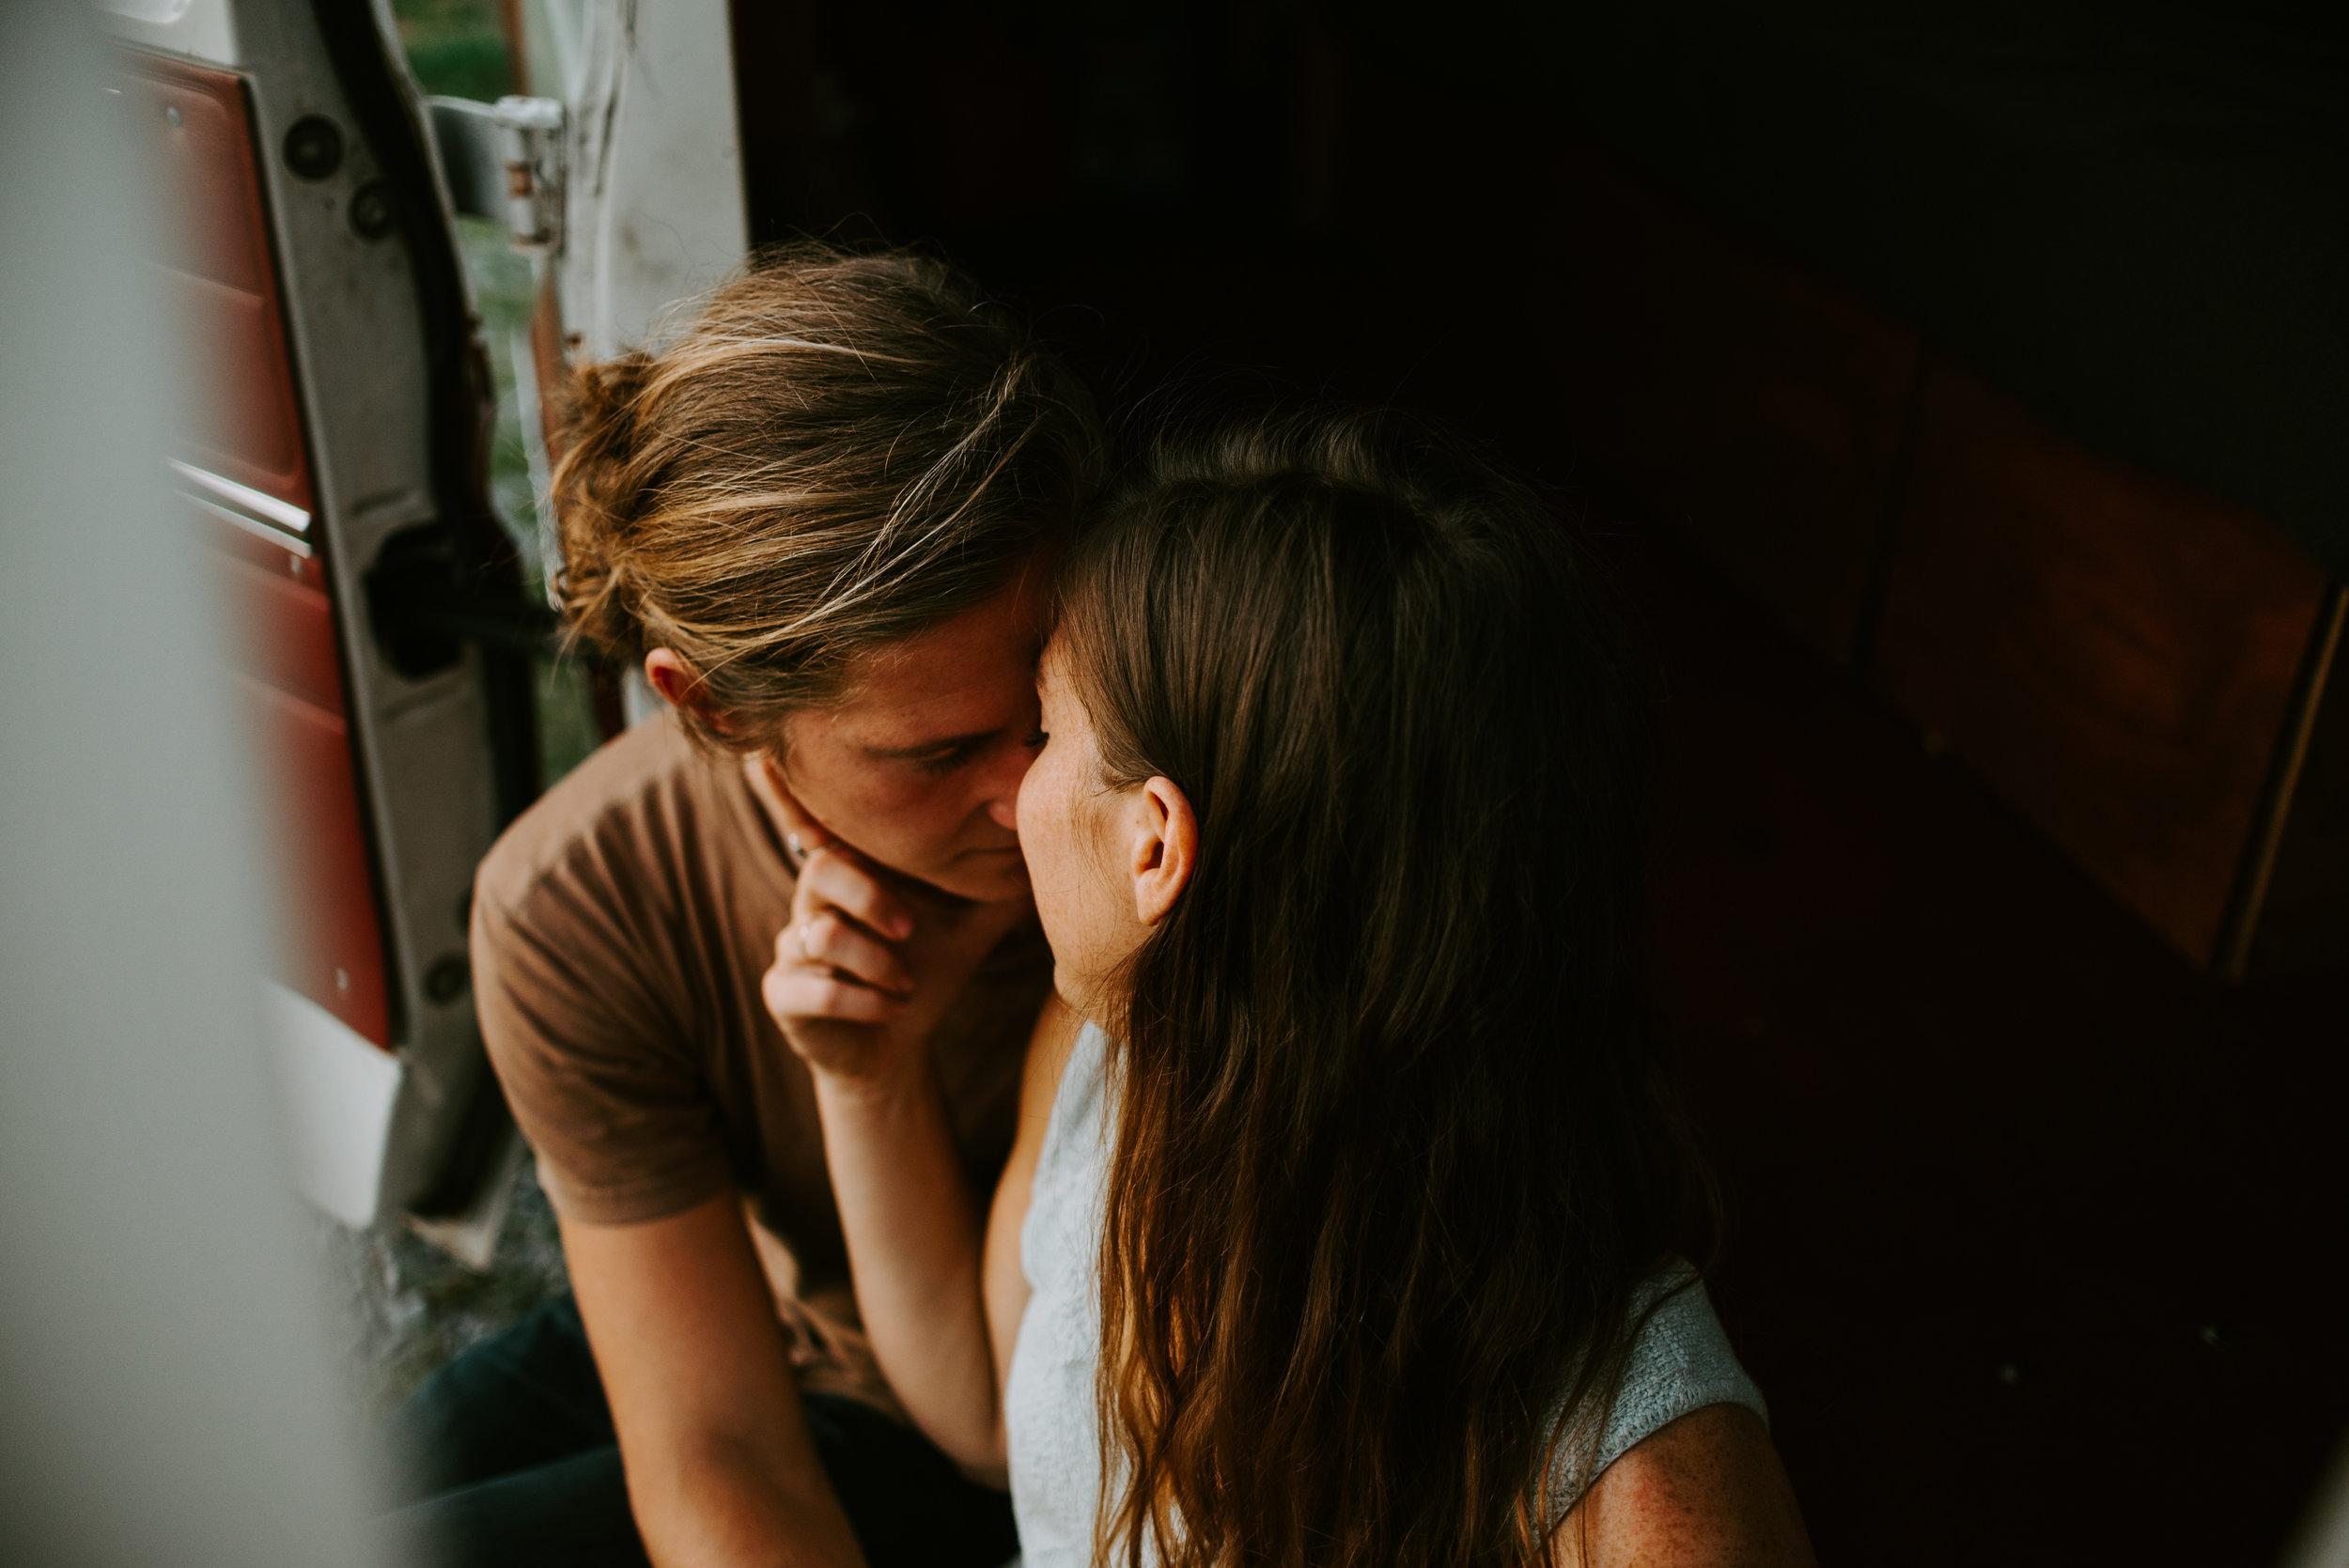 WonderlyCreative_Couples_7.9.18_Cameron&Alexis_-256.jpg